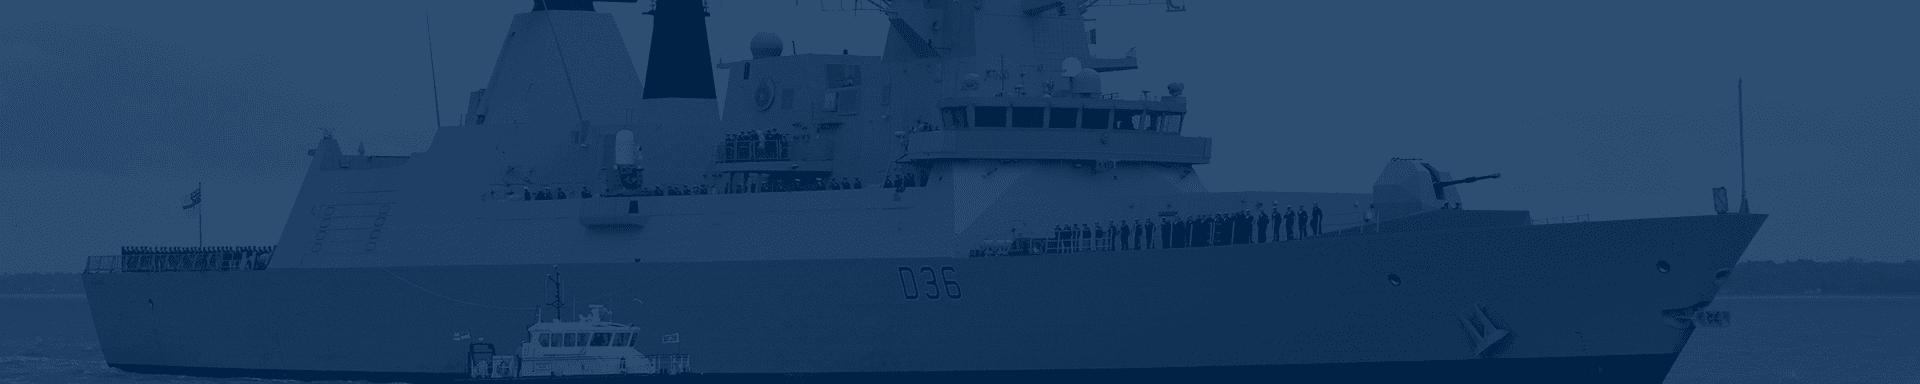 Warship product header image